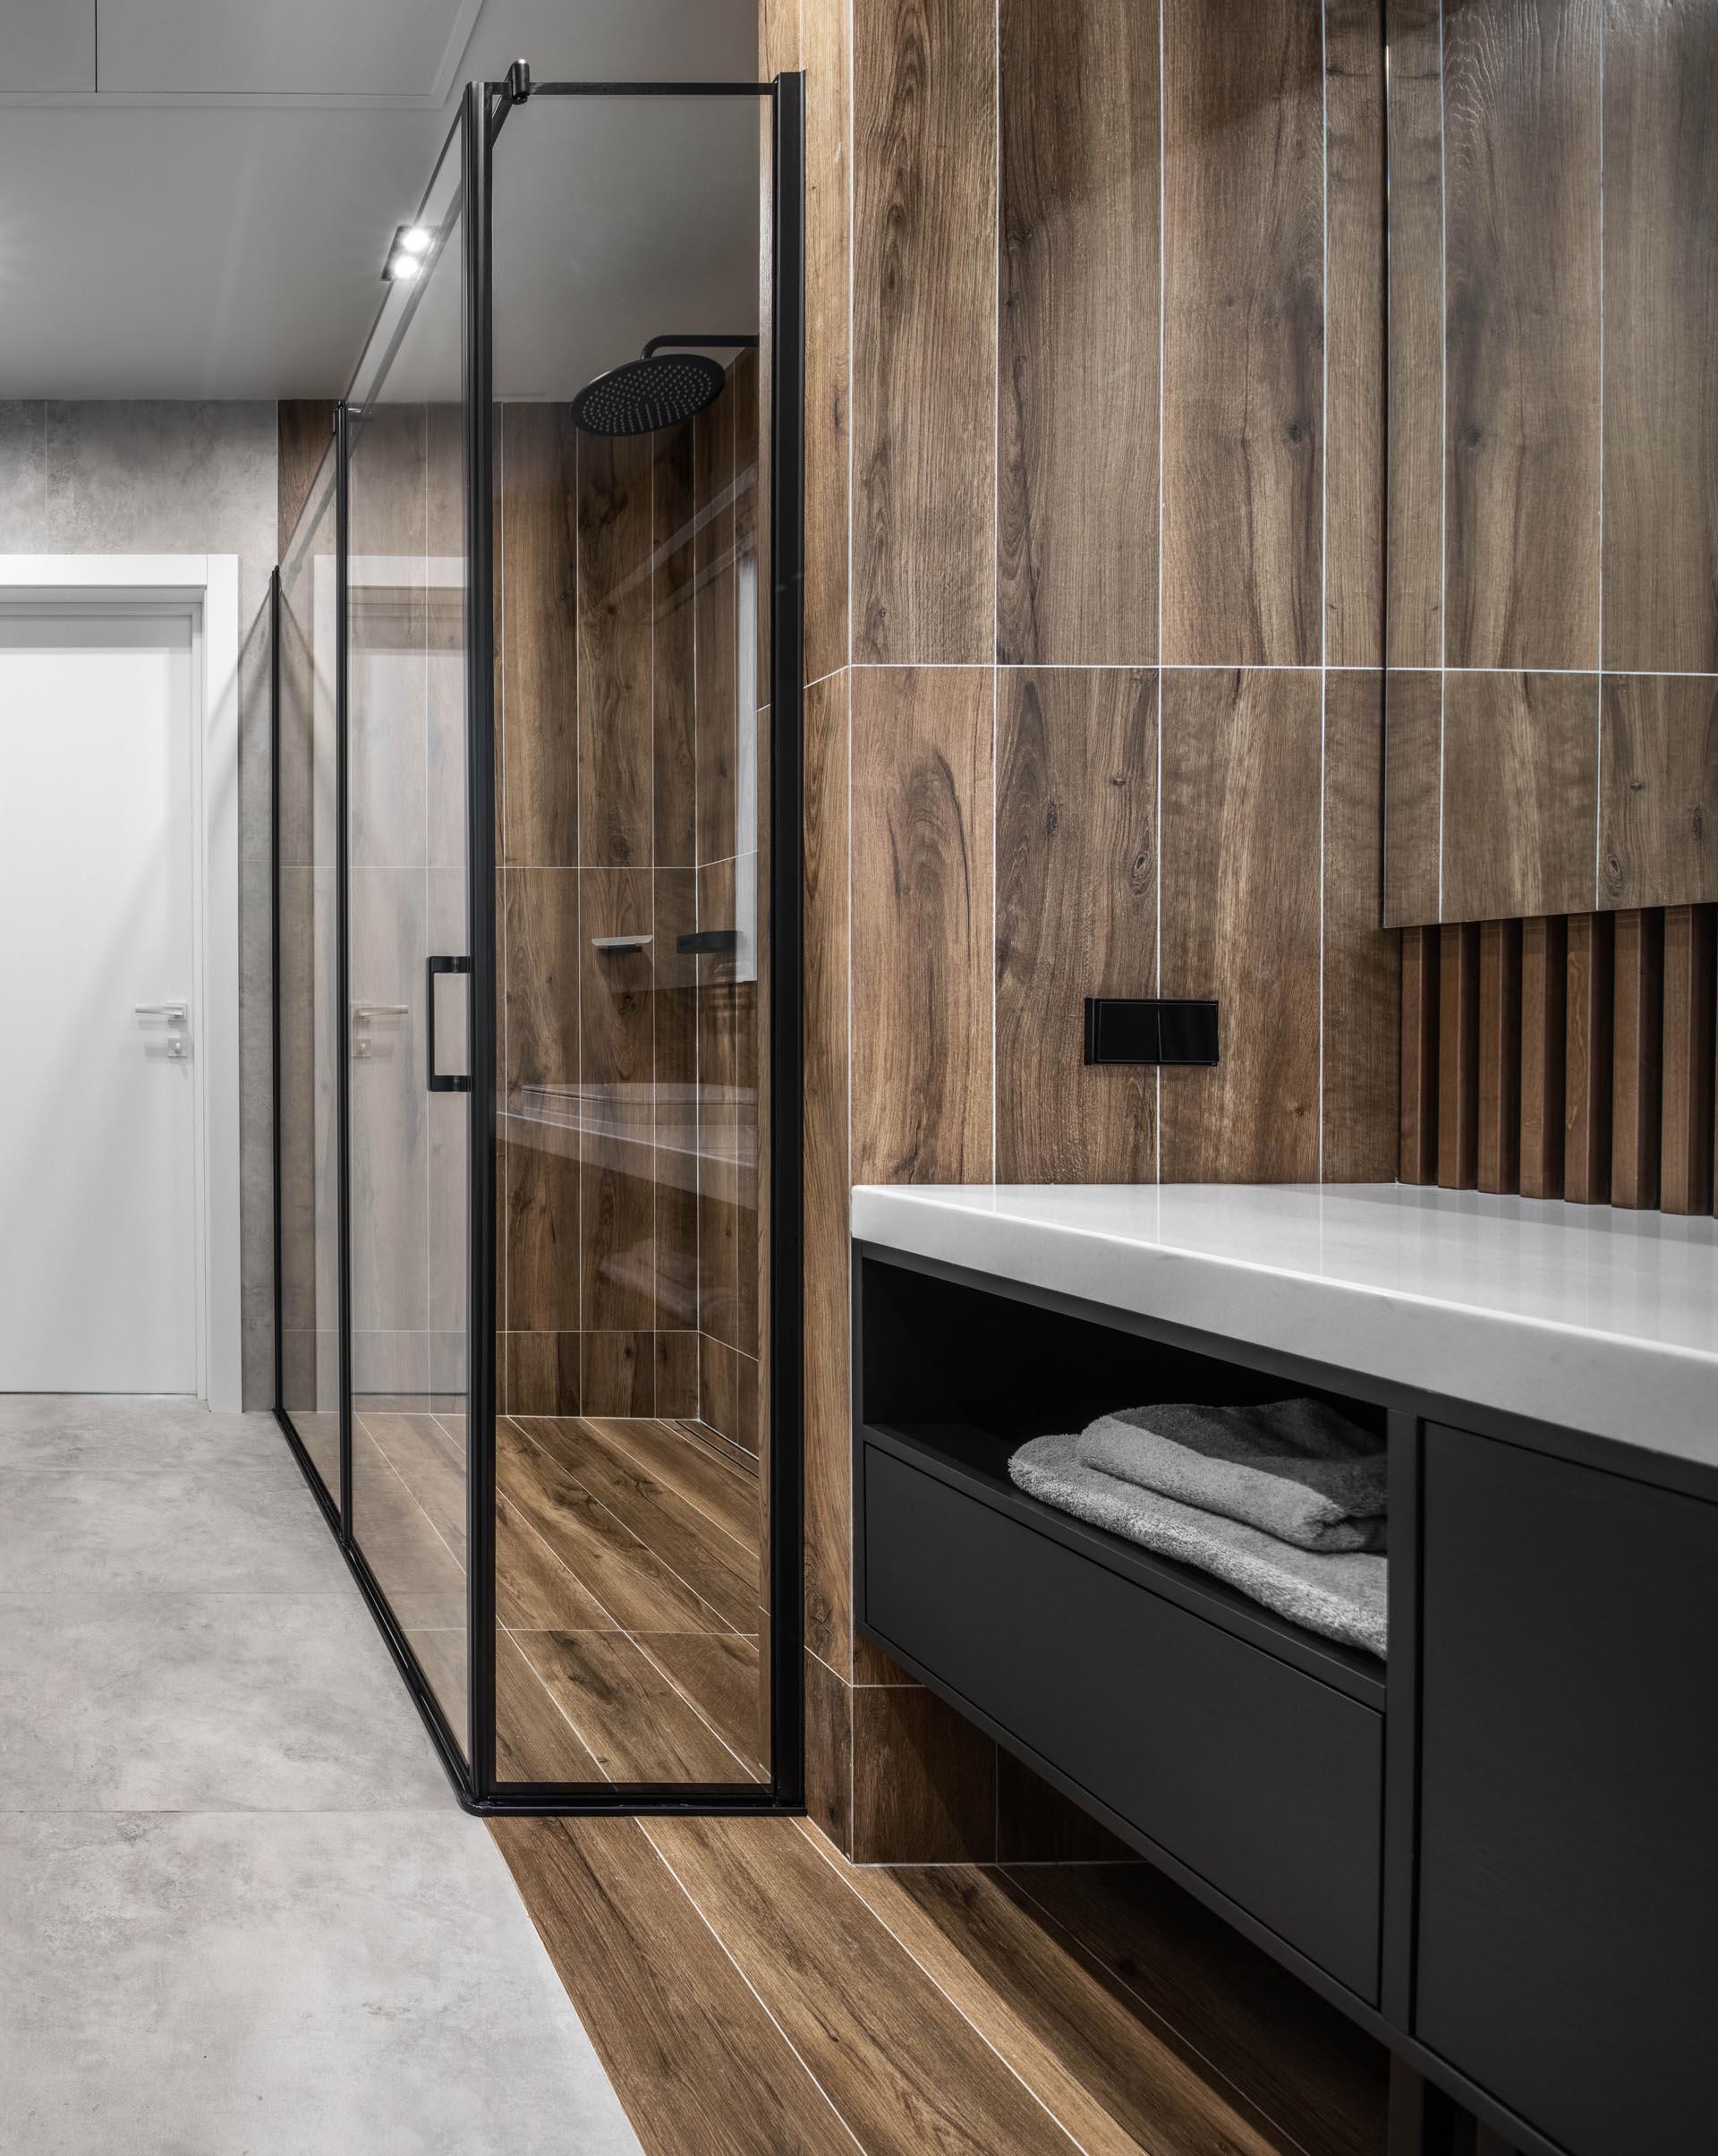 A modern bathroom with black vanity and wood-like ceramic tiles.